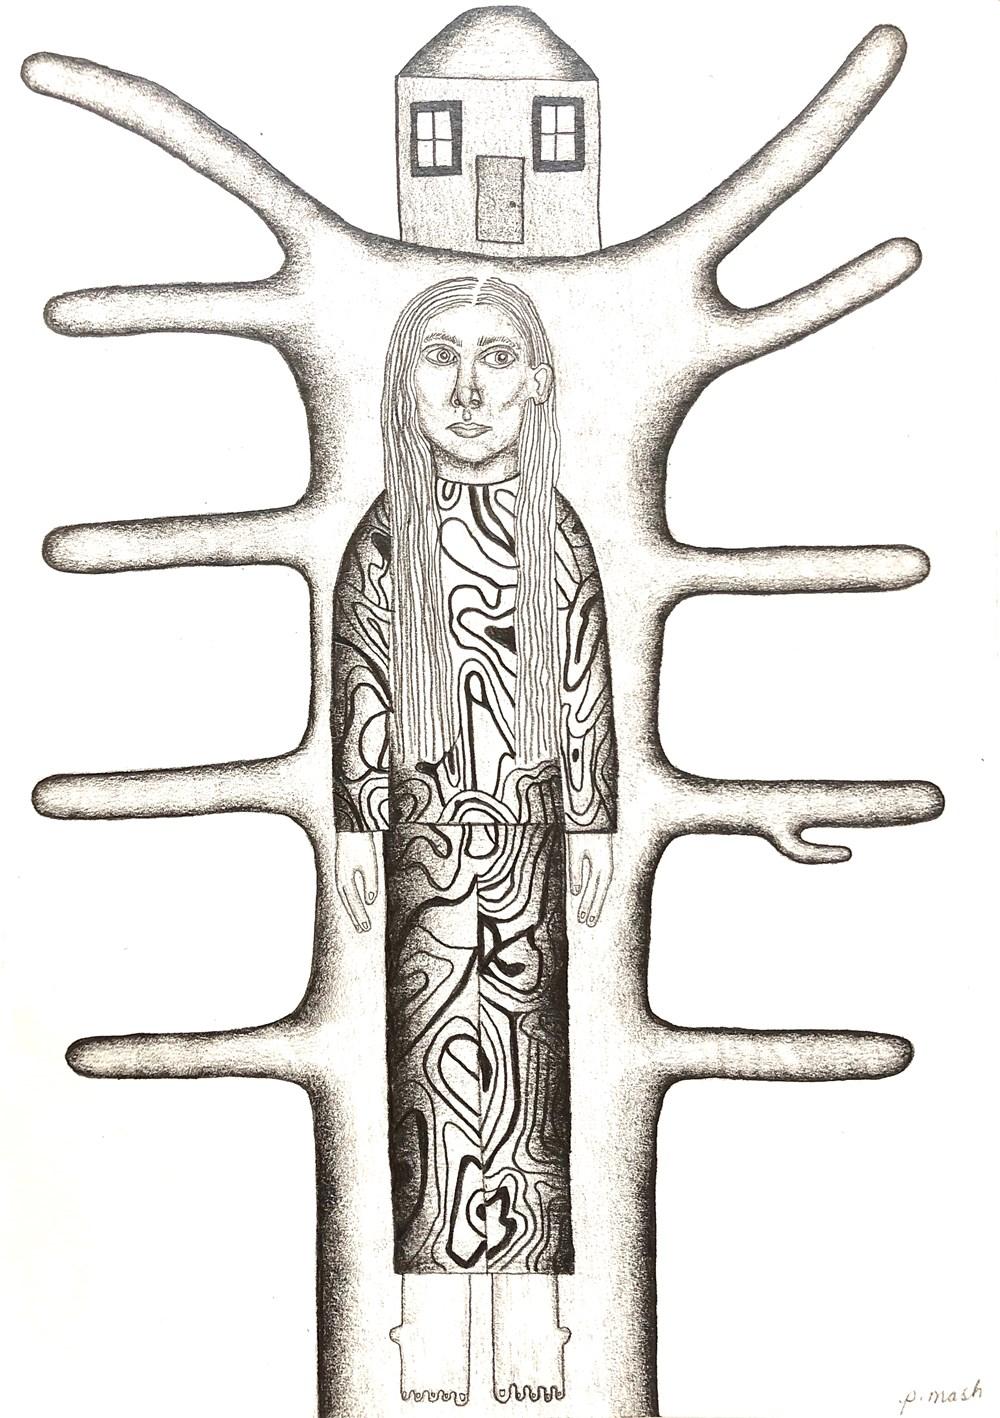 Life on Venus III | The Organic, Live Auction - Lot 16, Phoebe Mash, Untitled II (pencil on paper)